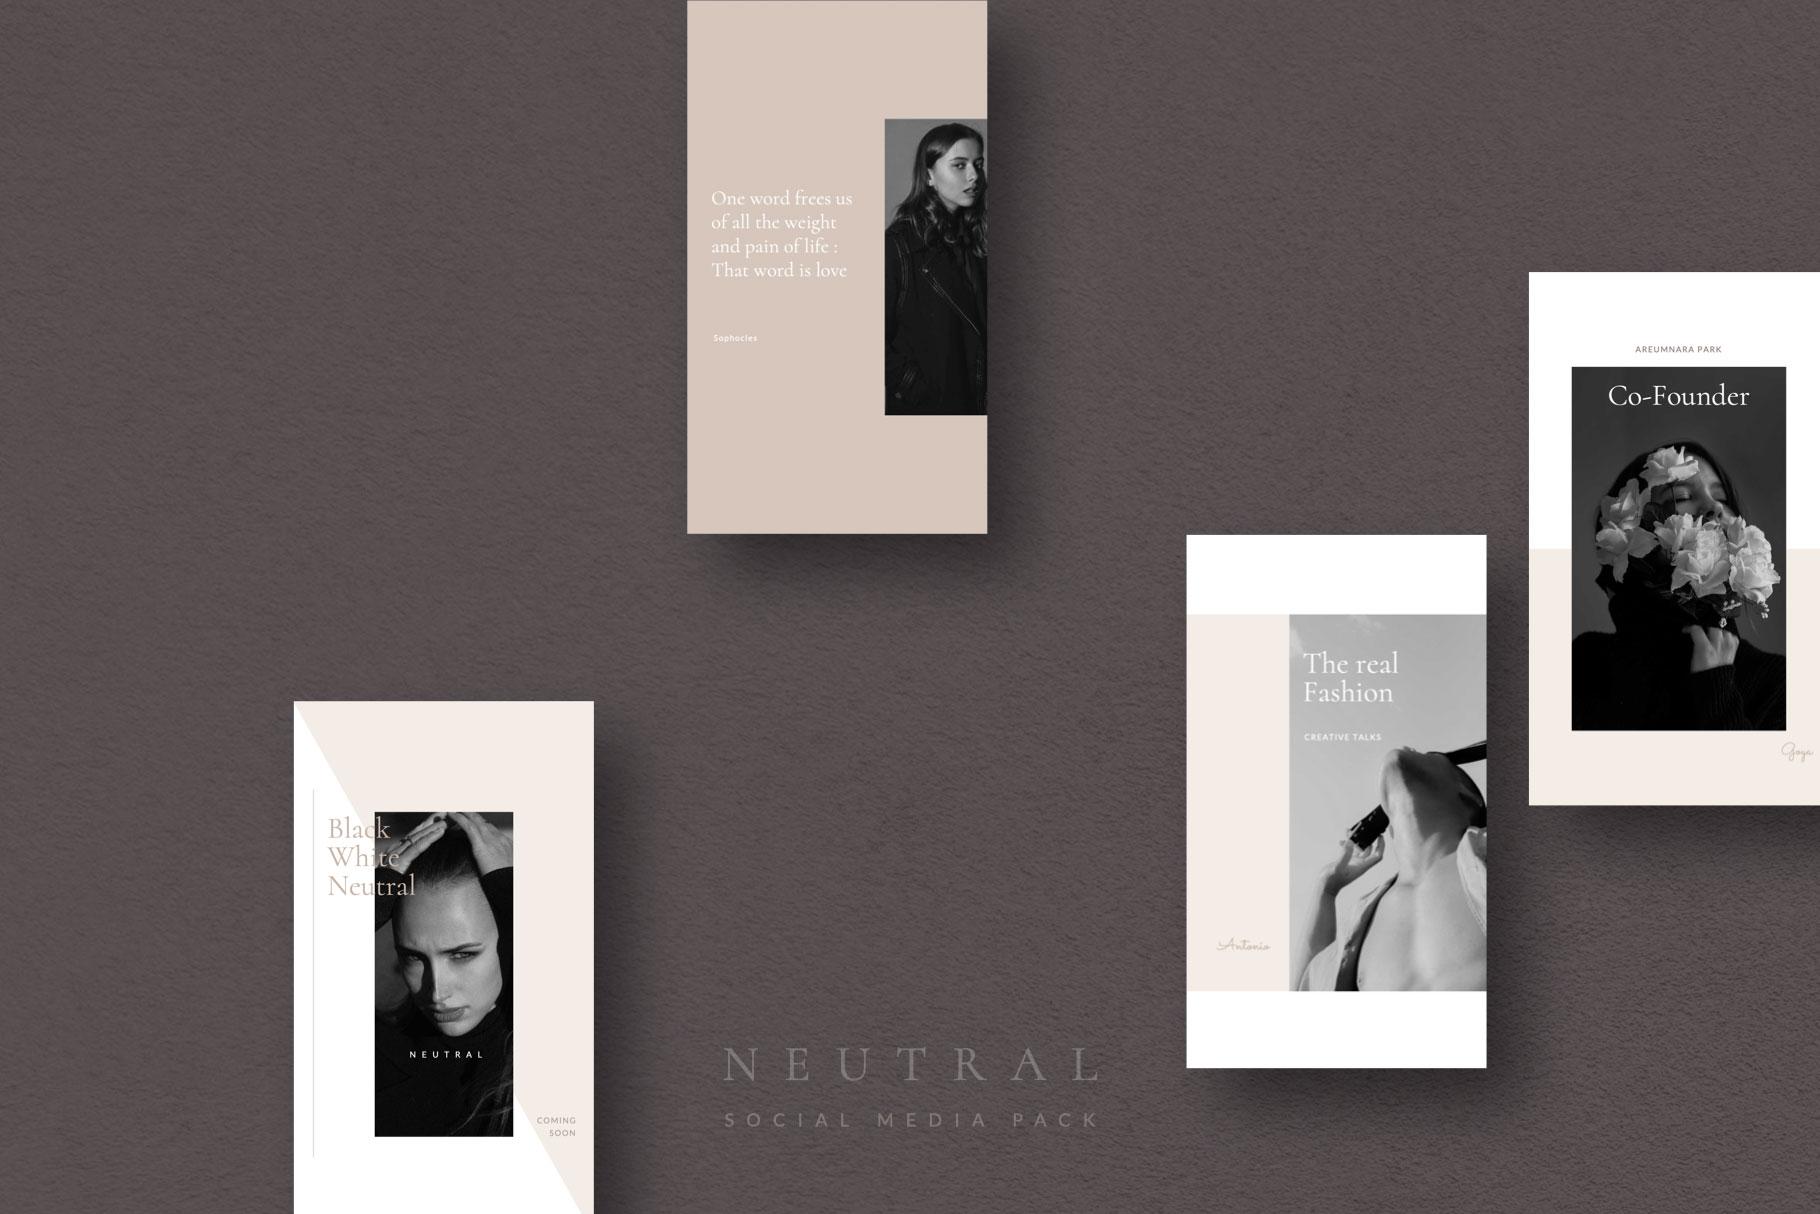 Neutral Social Media Pack